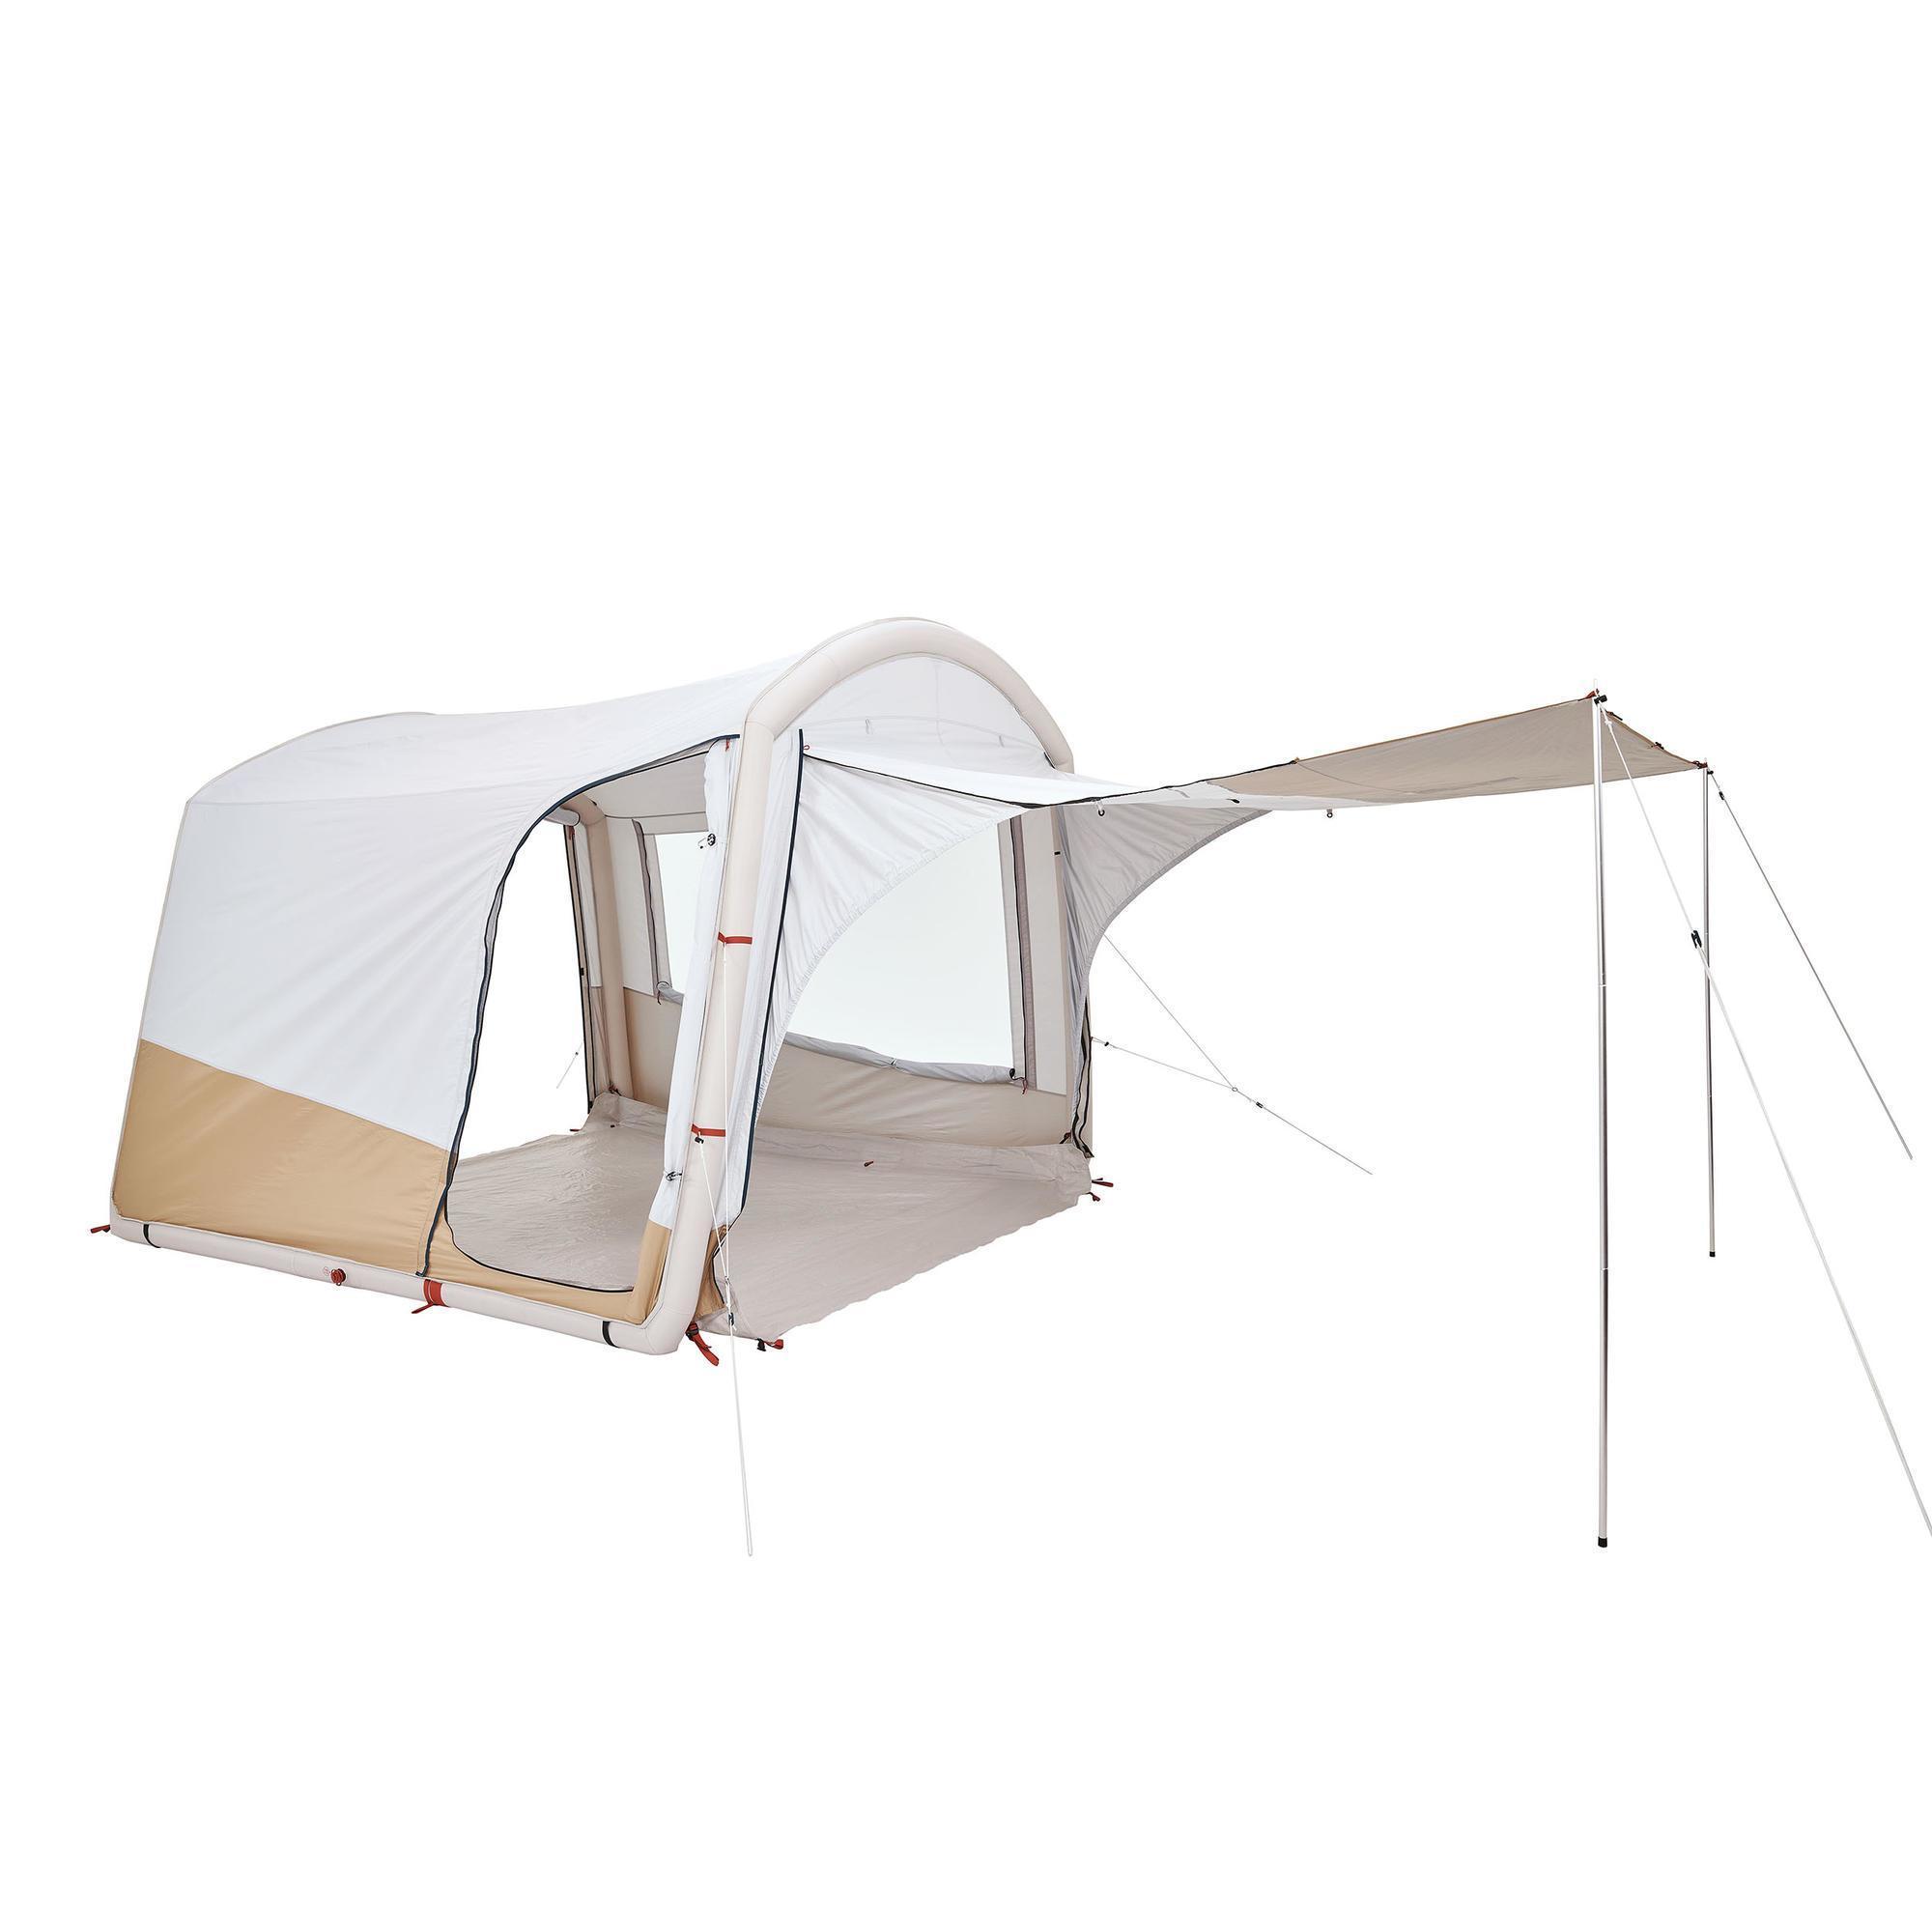 QUECHUA Gazebo campeggio AIR BASE CONNECT FRESH 6 POSTI Gonfiabile